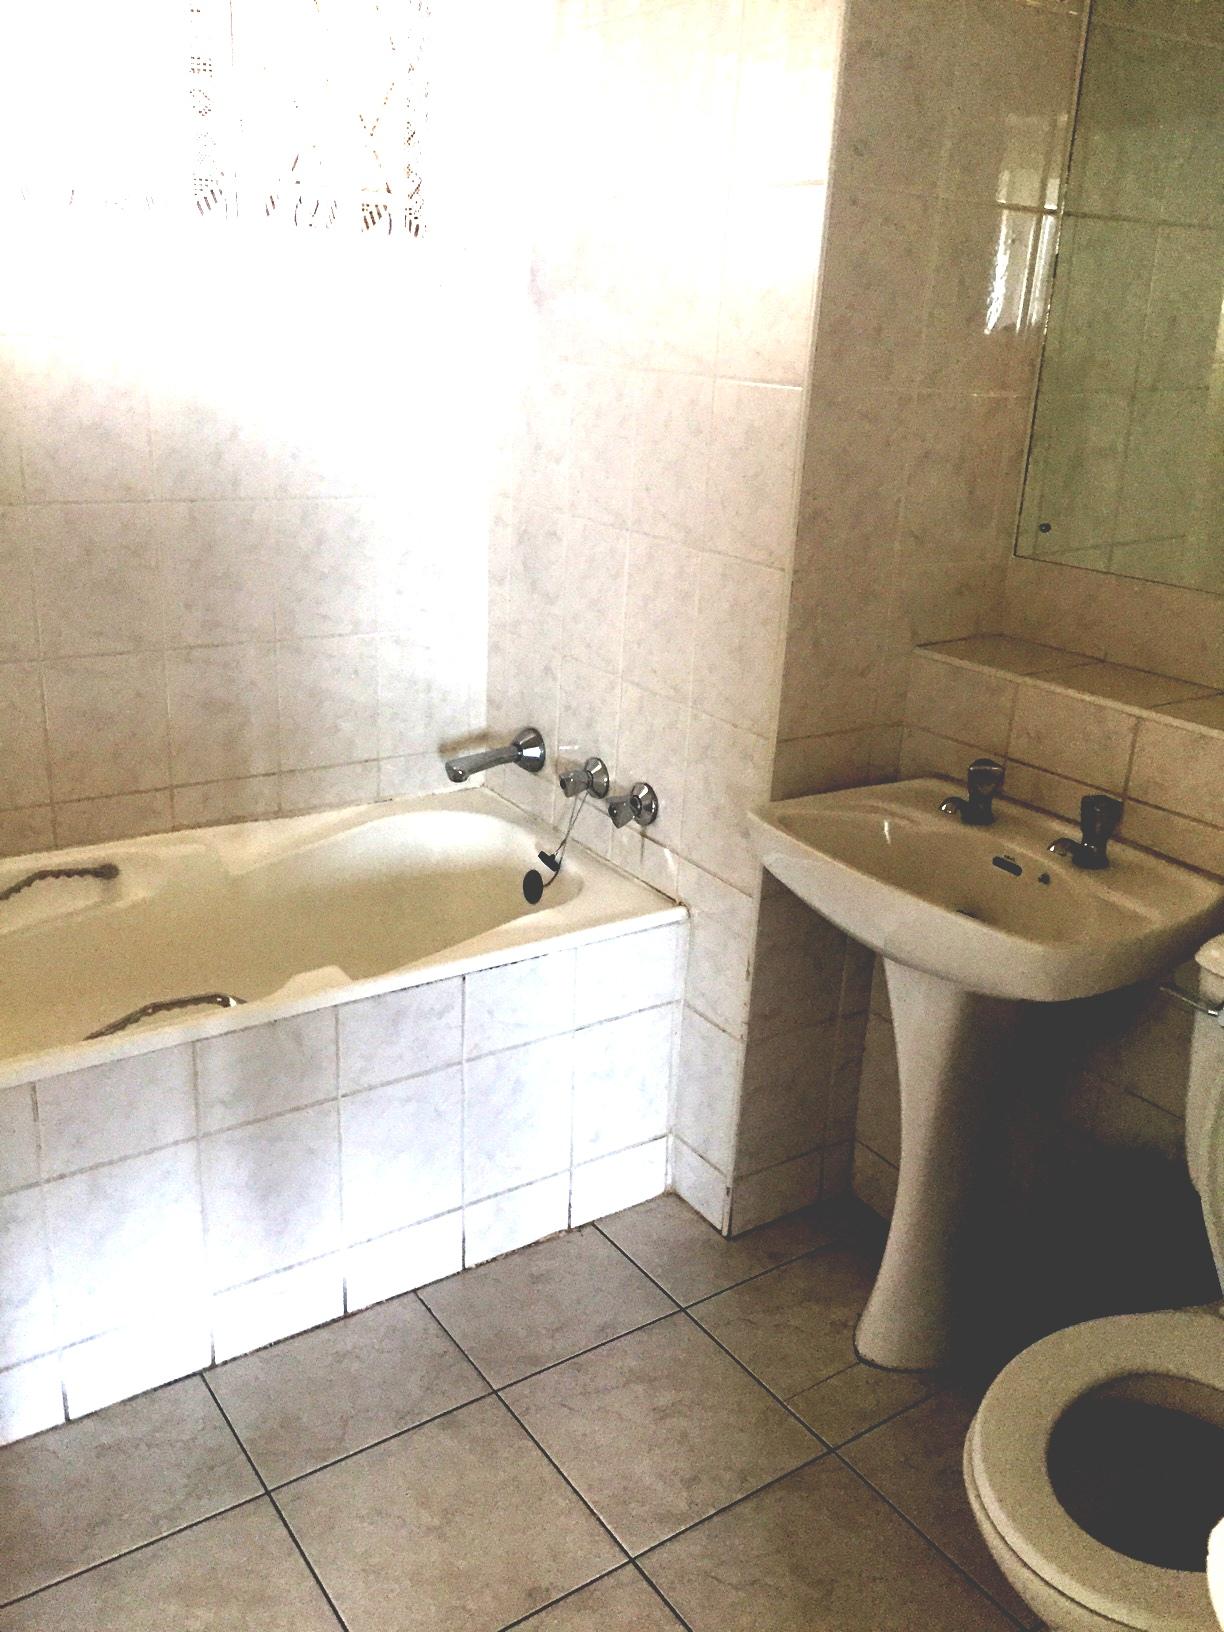 2 Bedroom Apartment for sale in Amanzimtoti ENT0055189 : photo#7